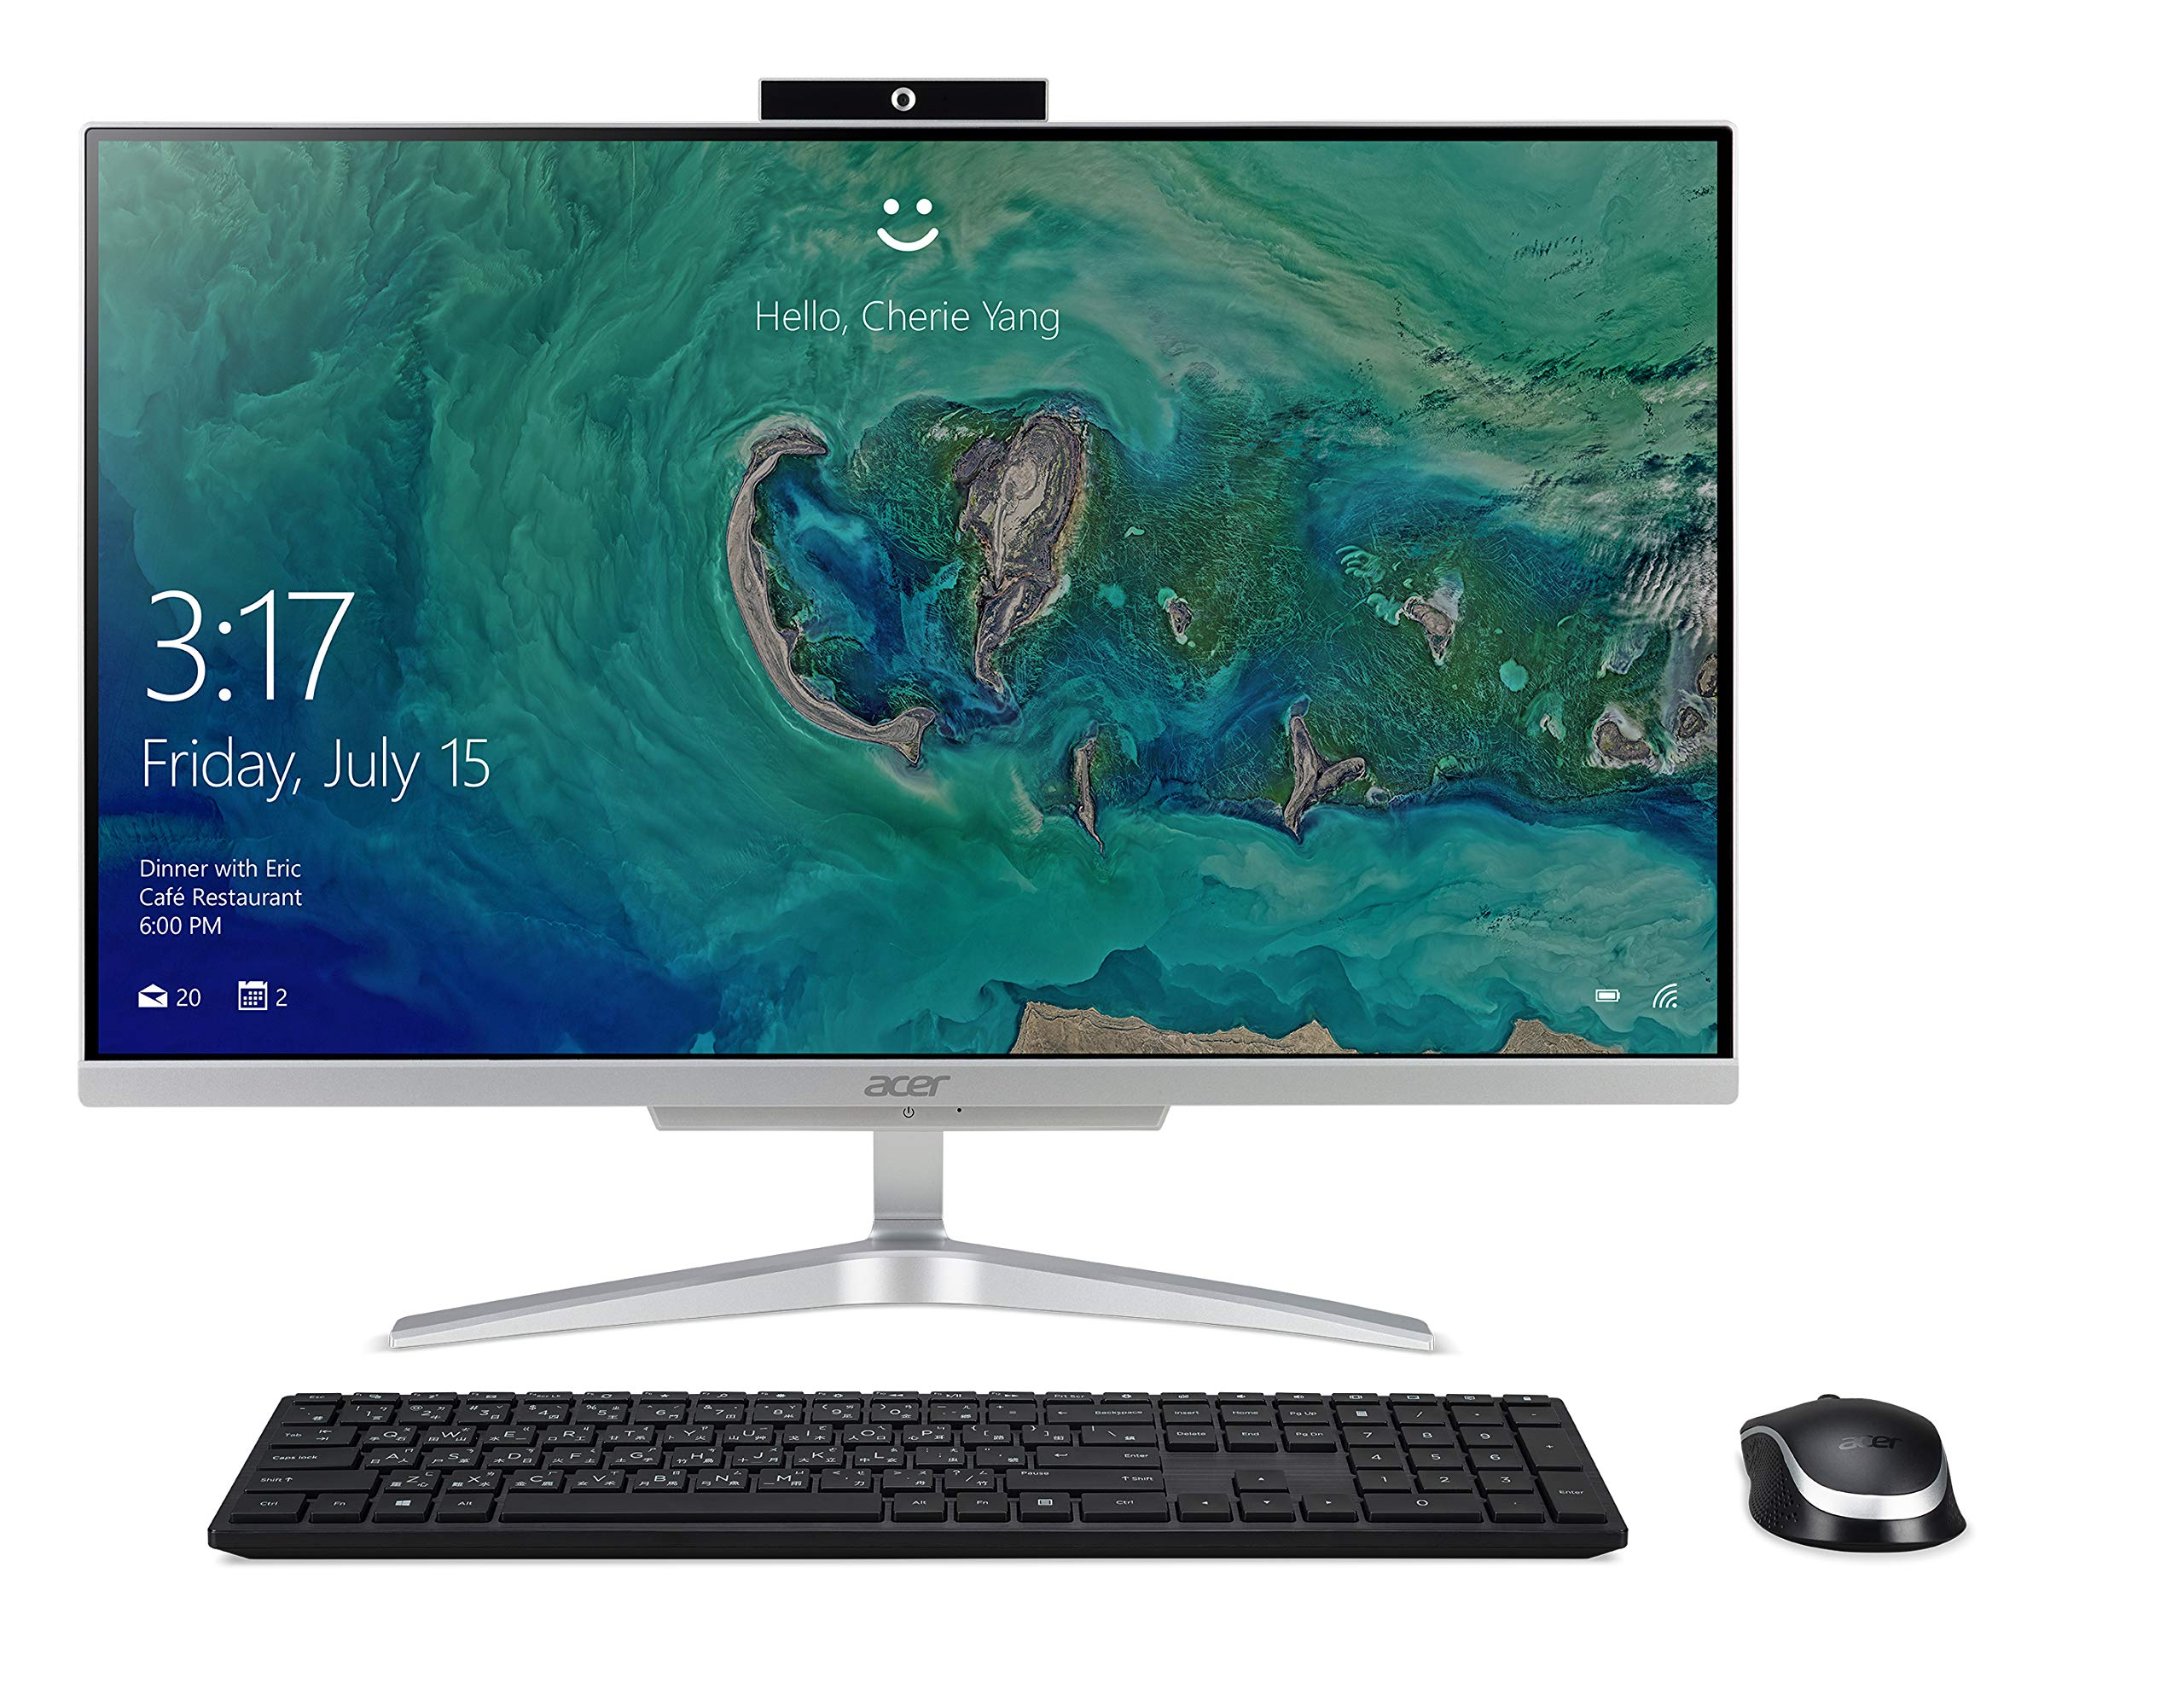 Acer Aspire C24-865-UA91 AIO Desktop, 23.8 inches Full HD, 8th Gen Intel Core i5-8250U, 8GB DDR4, 1TB HDD, 802.11AC Wifi, Wireless Keyboard and Mouse, Windows 10 Home, Silver